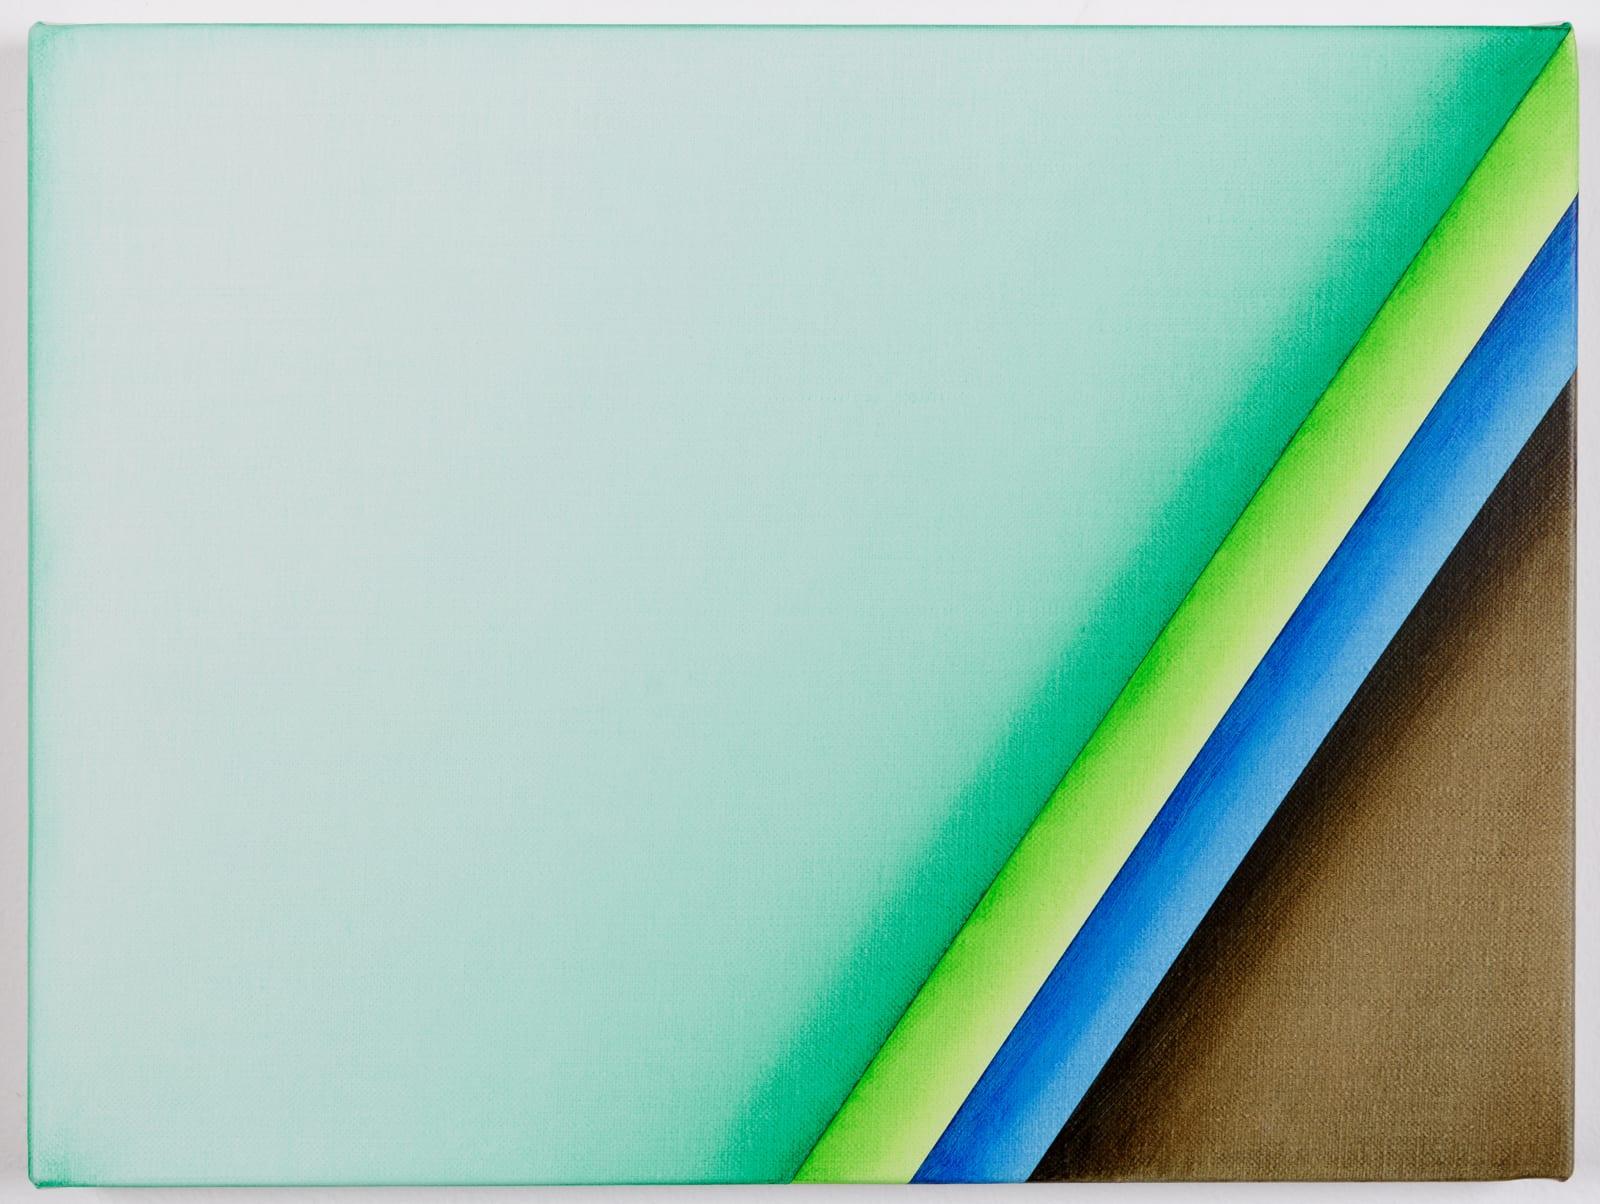 Selma Parlour, Detail shot, code II, 2017